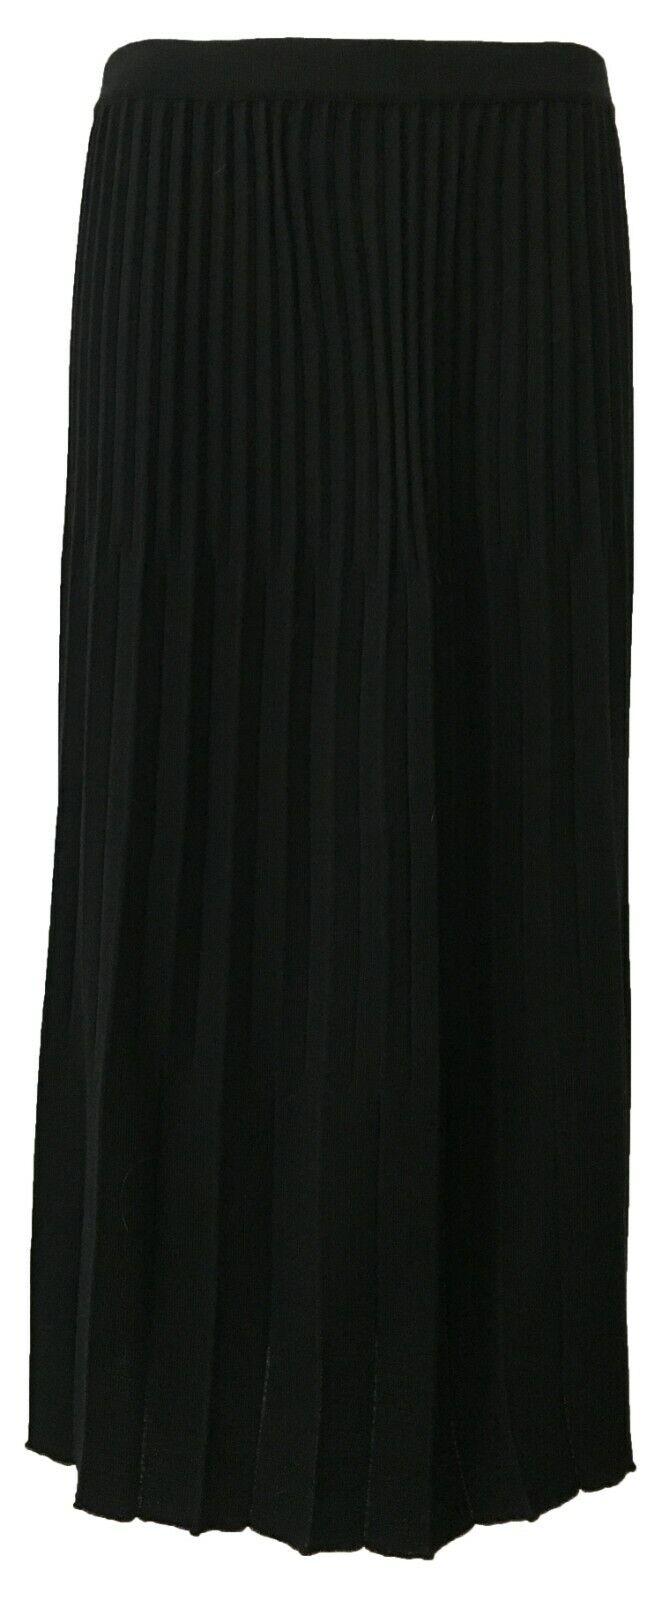 ELENA MIRÒ skirt woman jersey pleated with elastic waist coated 50% wool